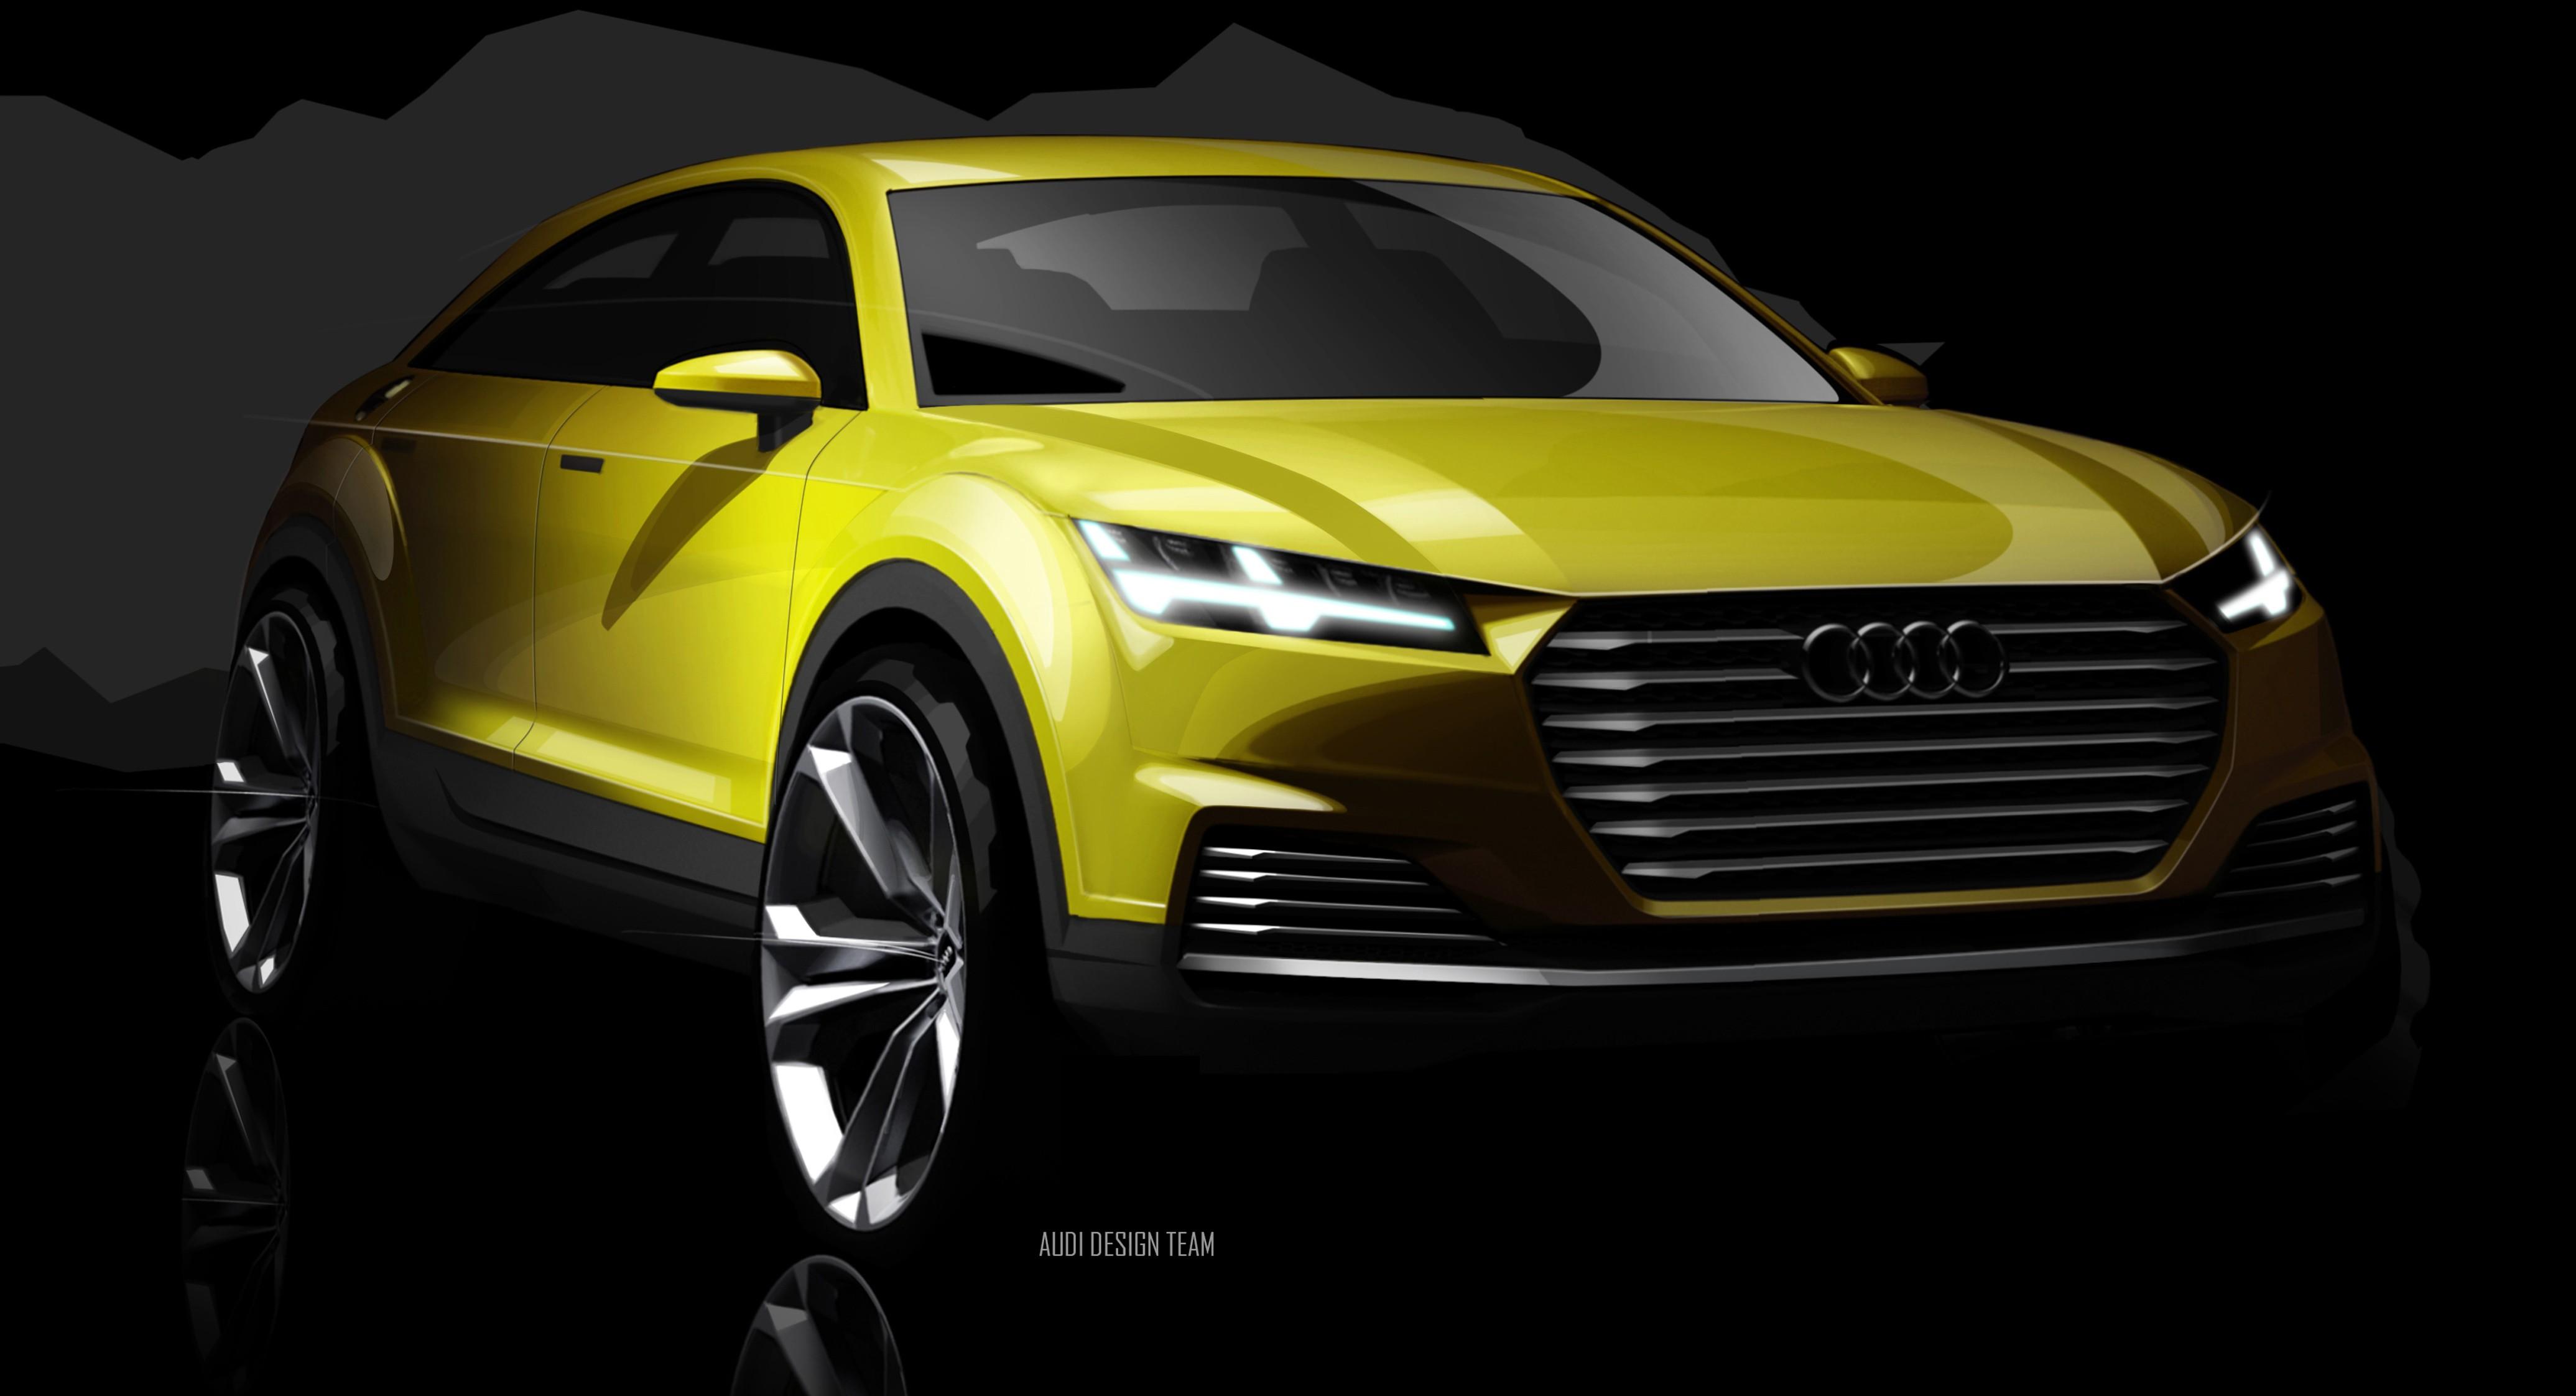 Audi Tt Offroad Concept Previews Future Q4 Suv Image 242684